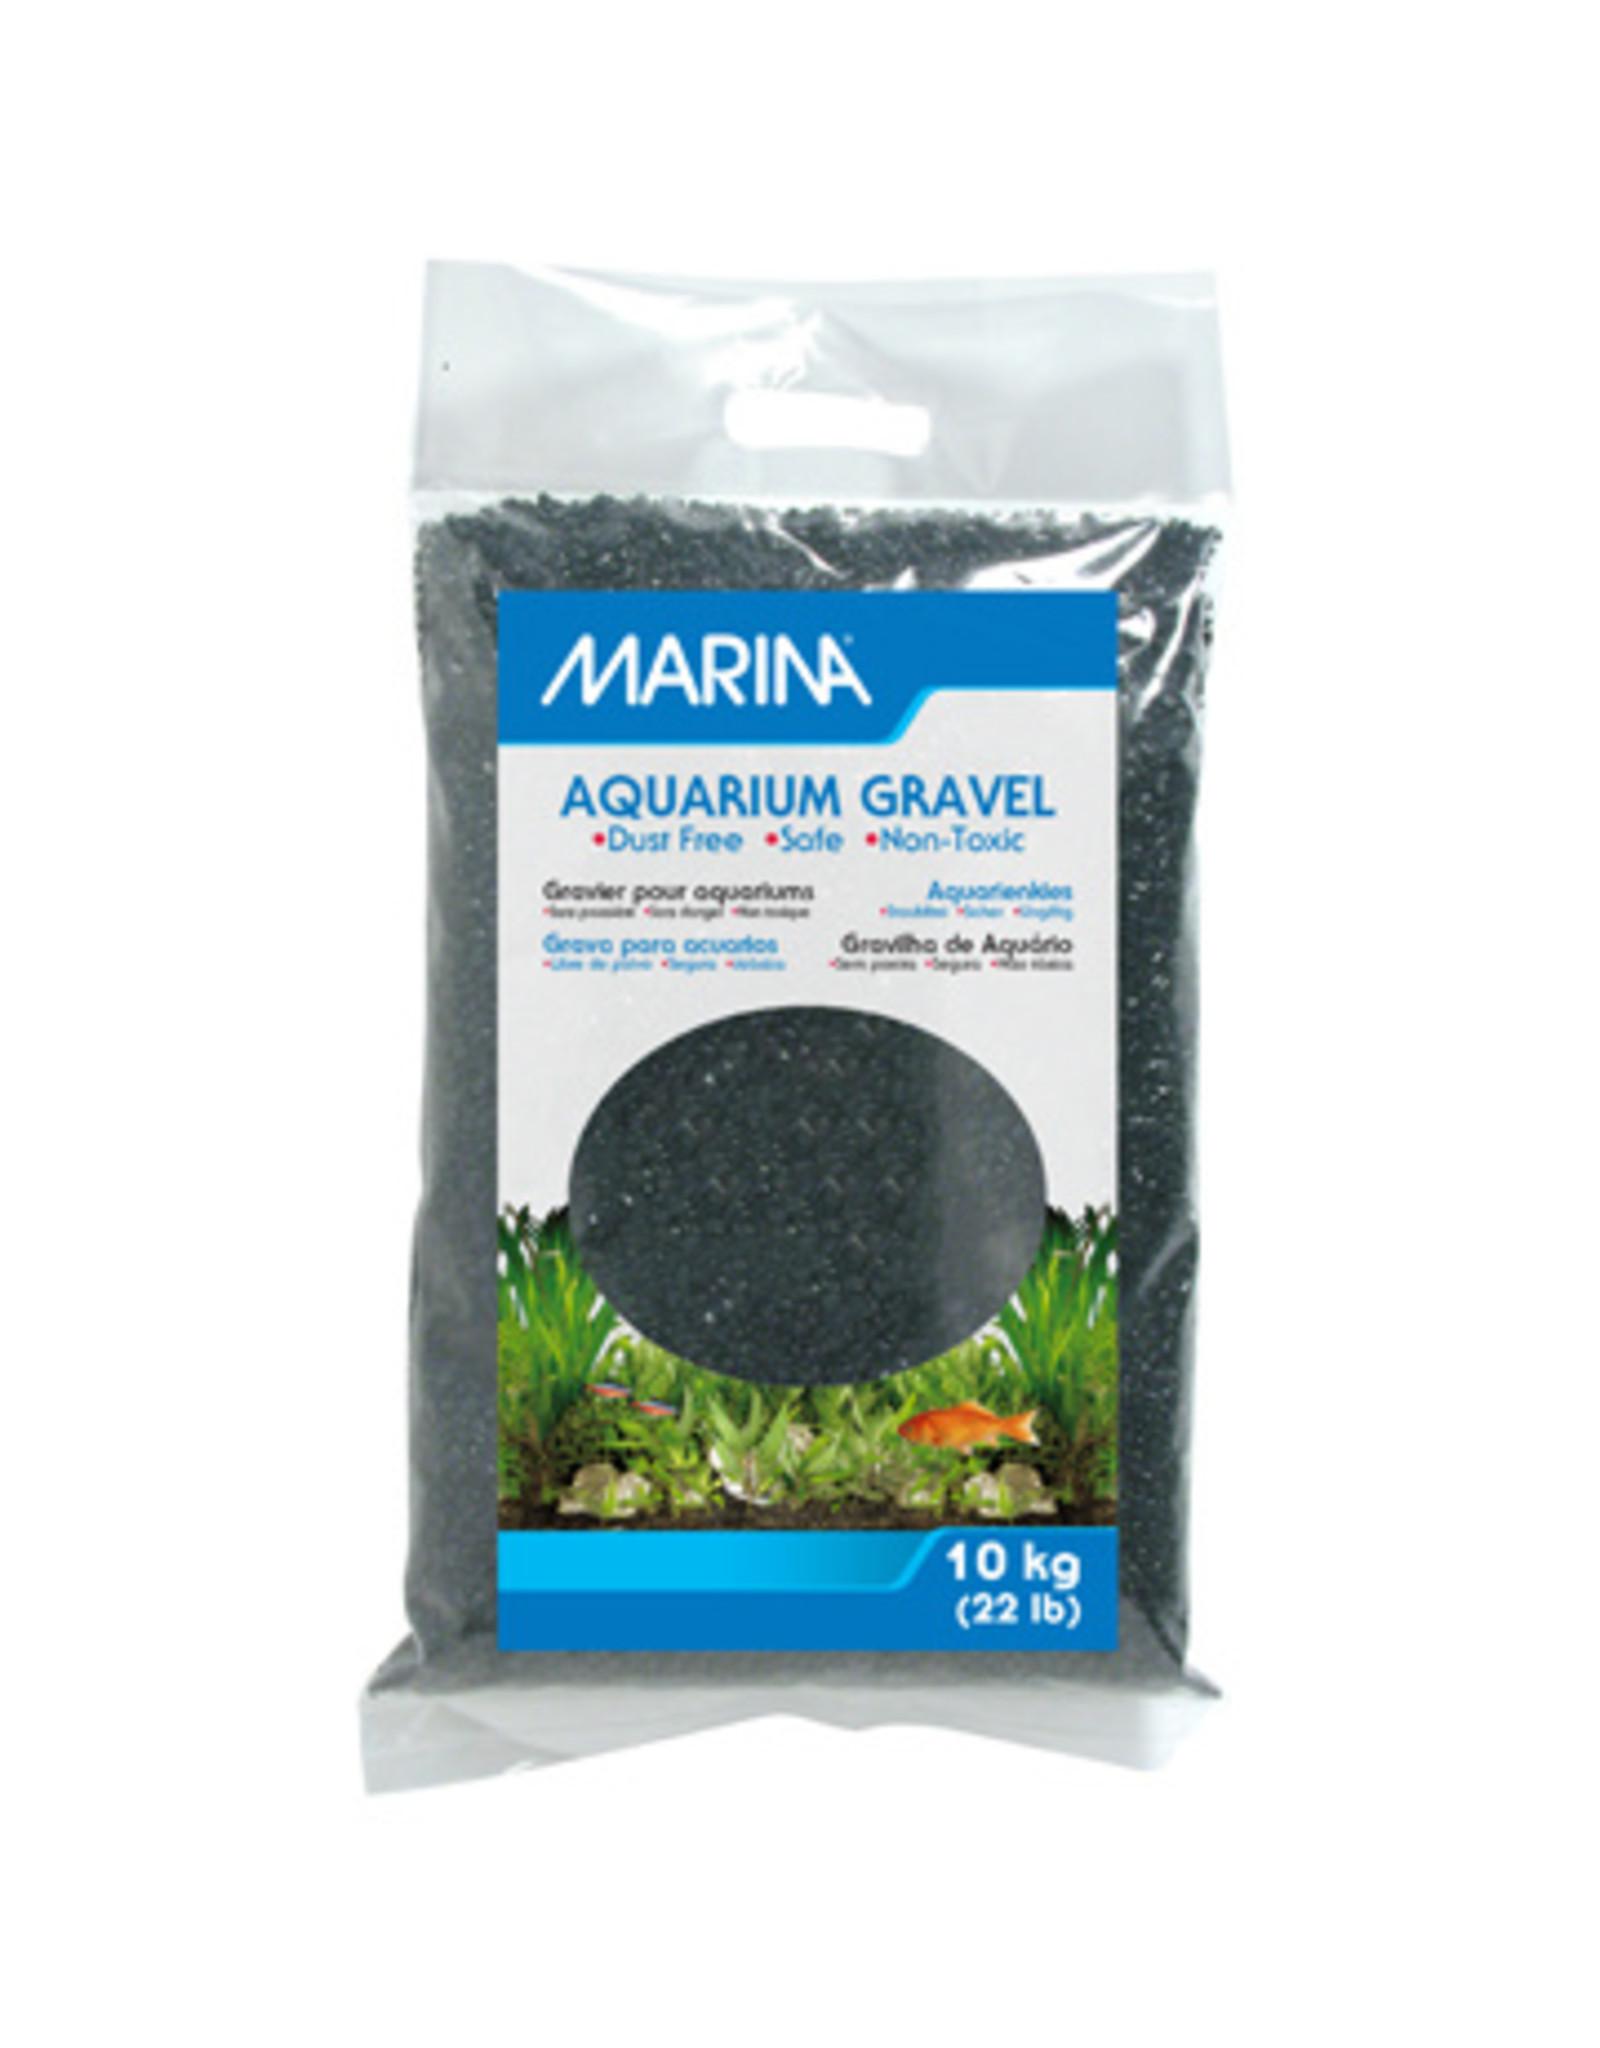 Marina MARINA Aquarium Gravel Black